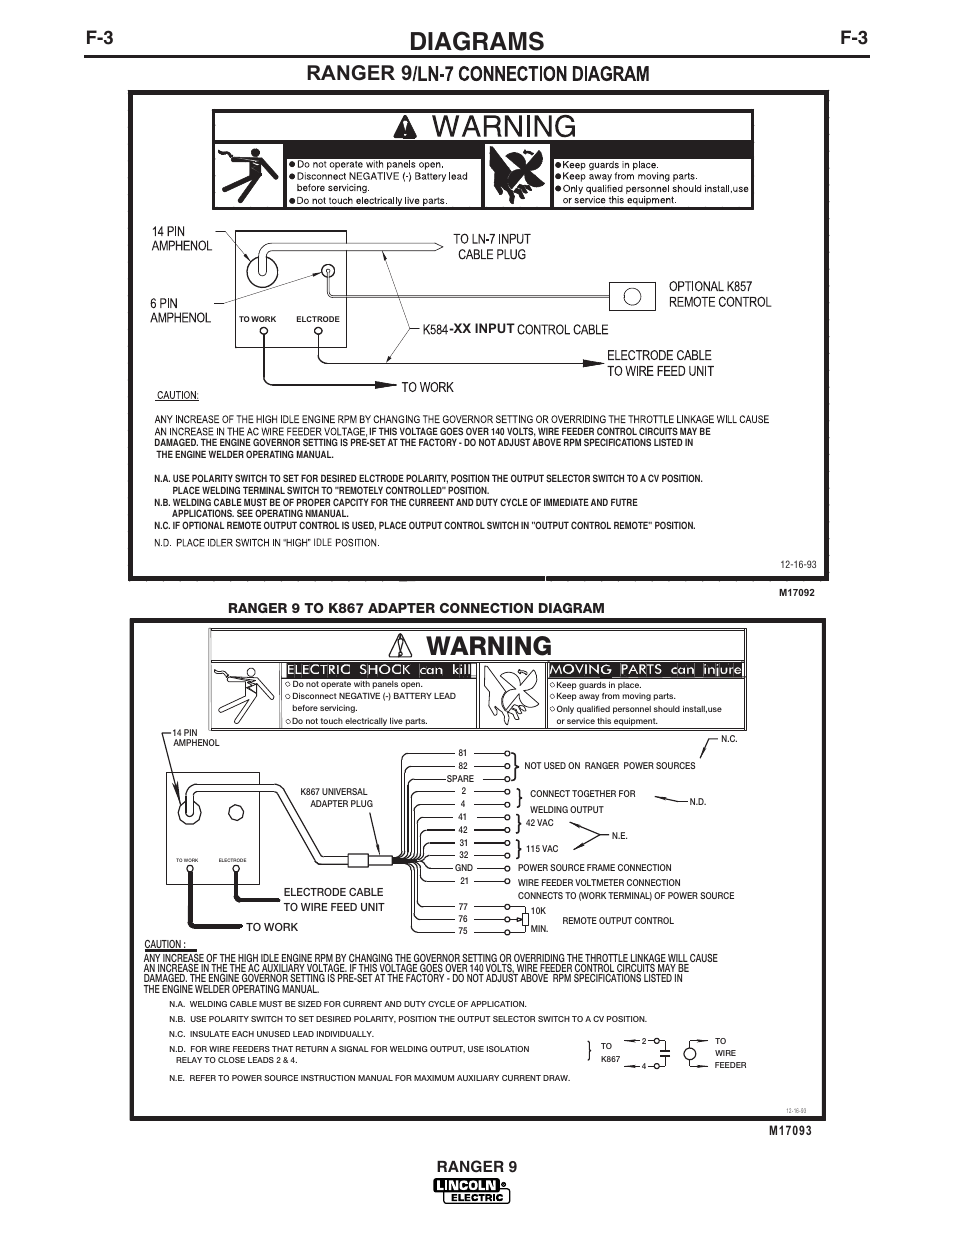 Diagrams, Warning, Ranger 9 | Lincoln Electric IM753 RANGER 9 User ...